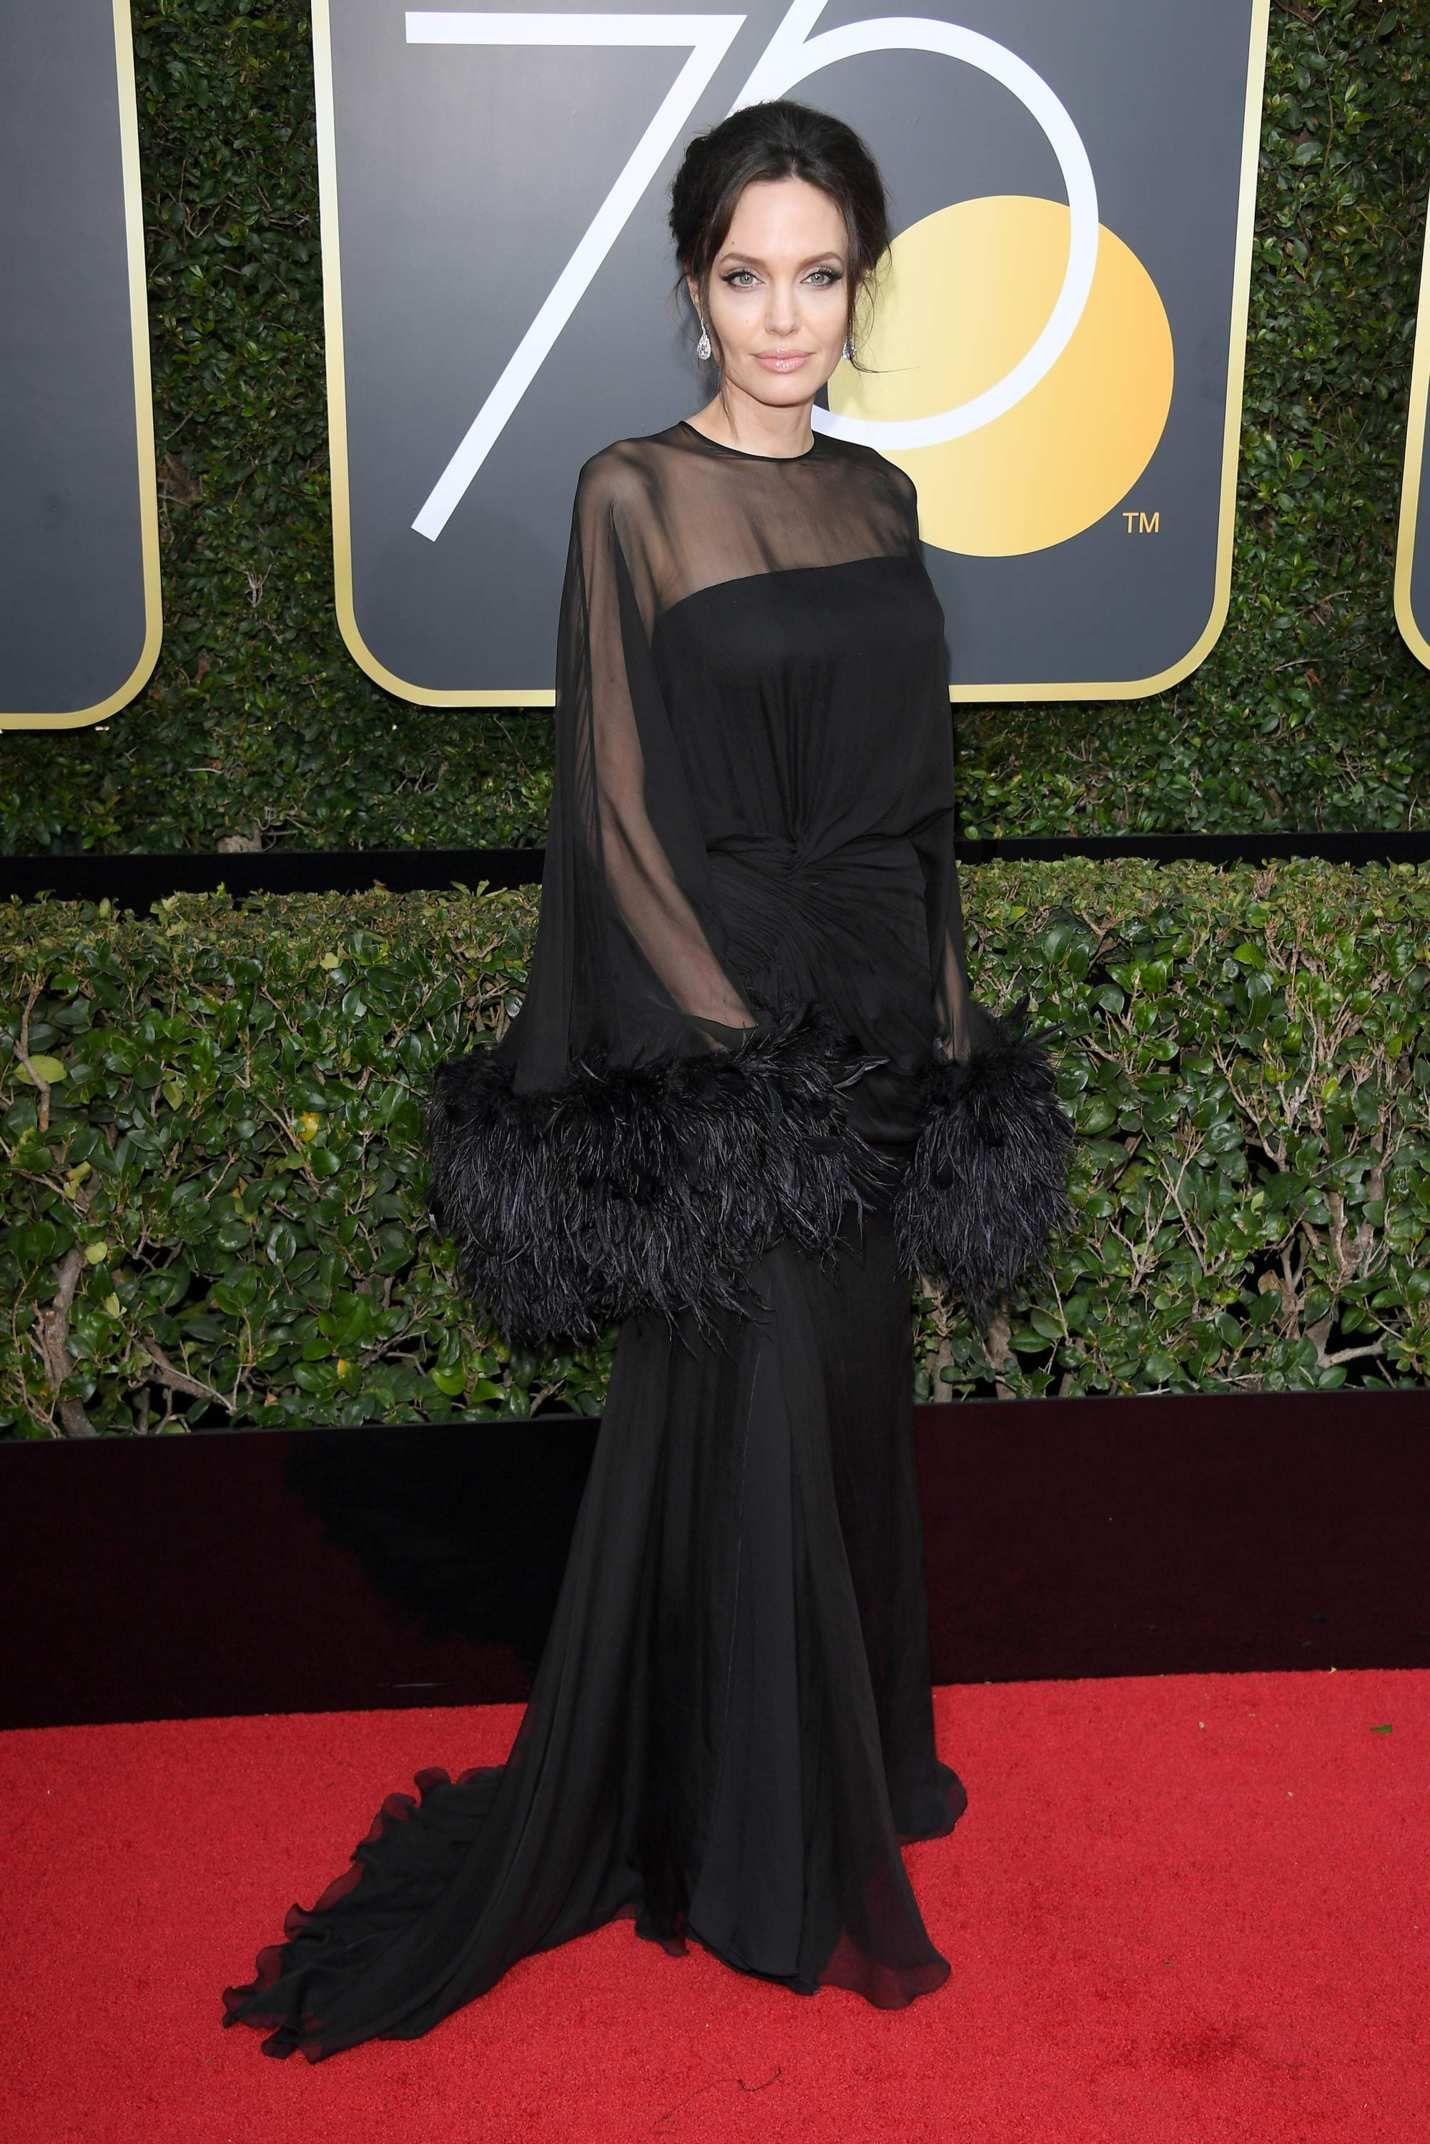 4b932f00e9ea Angelina Jolie at Golden Globes 2018. #MeToo #TimesUp | RED CARPET ...